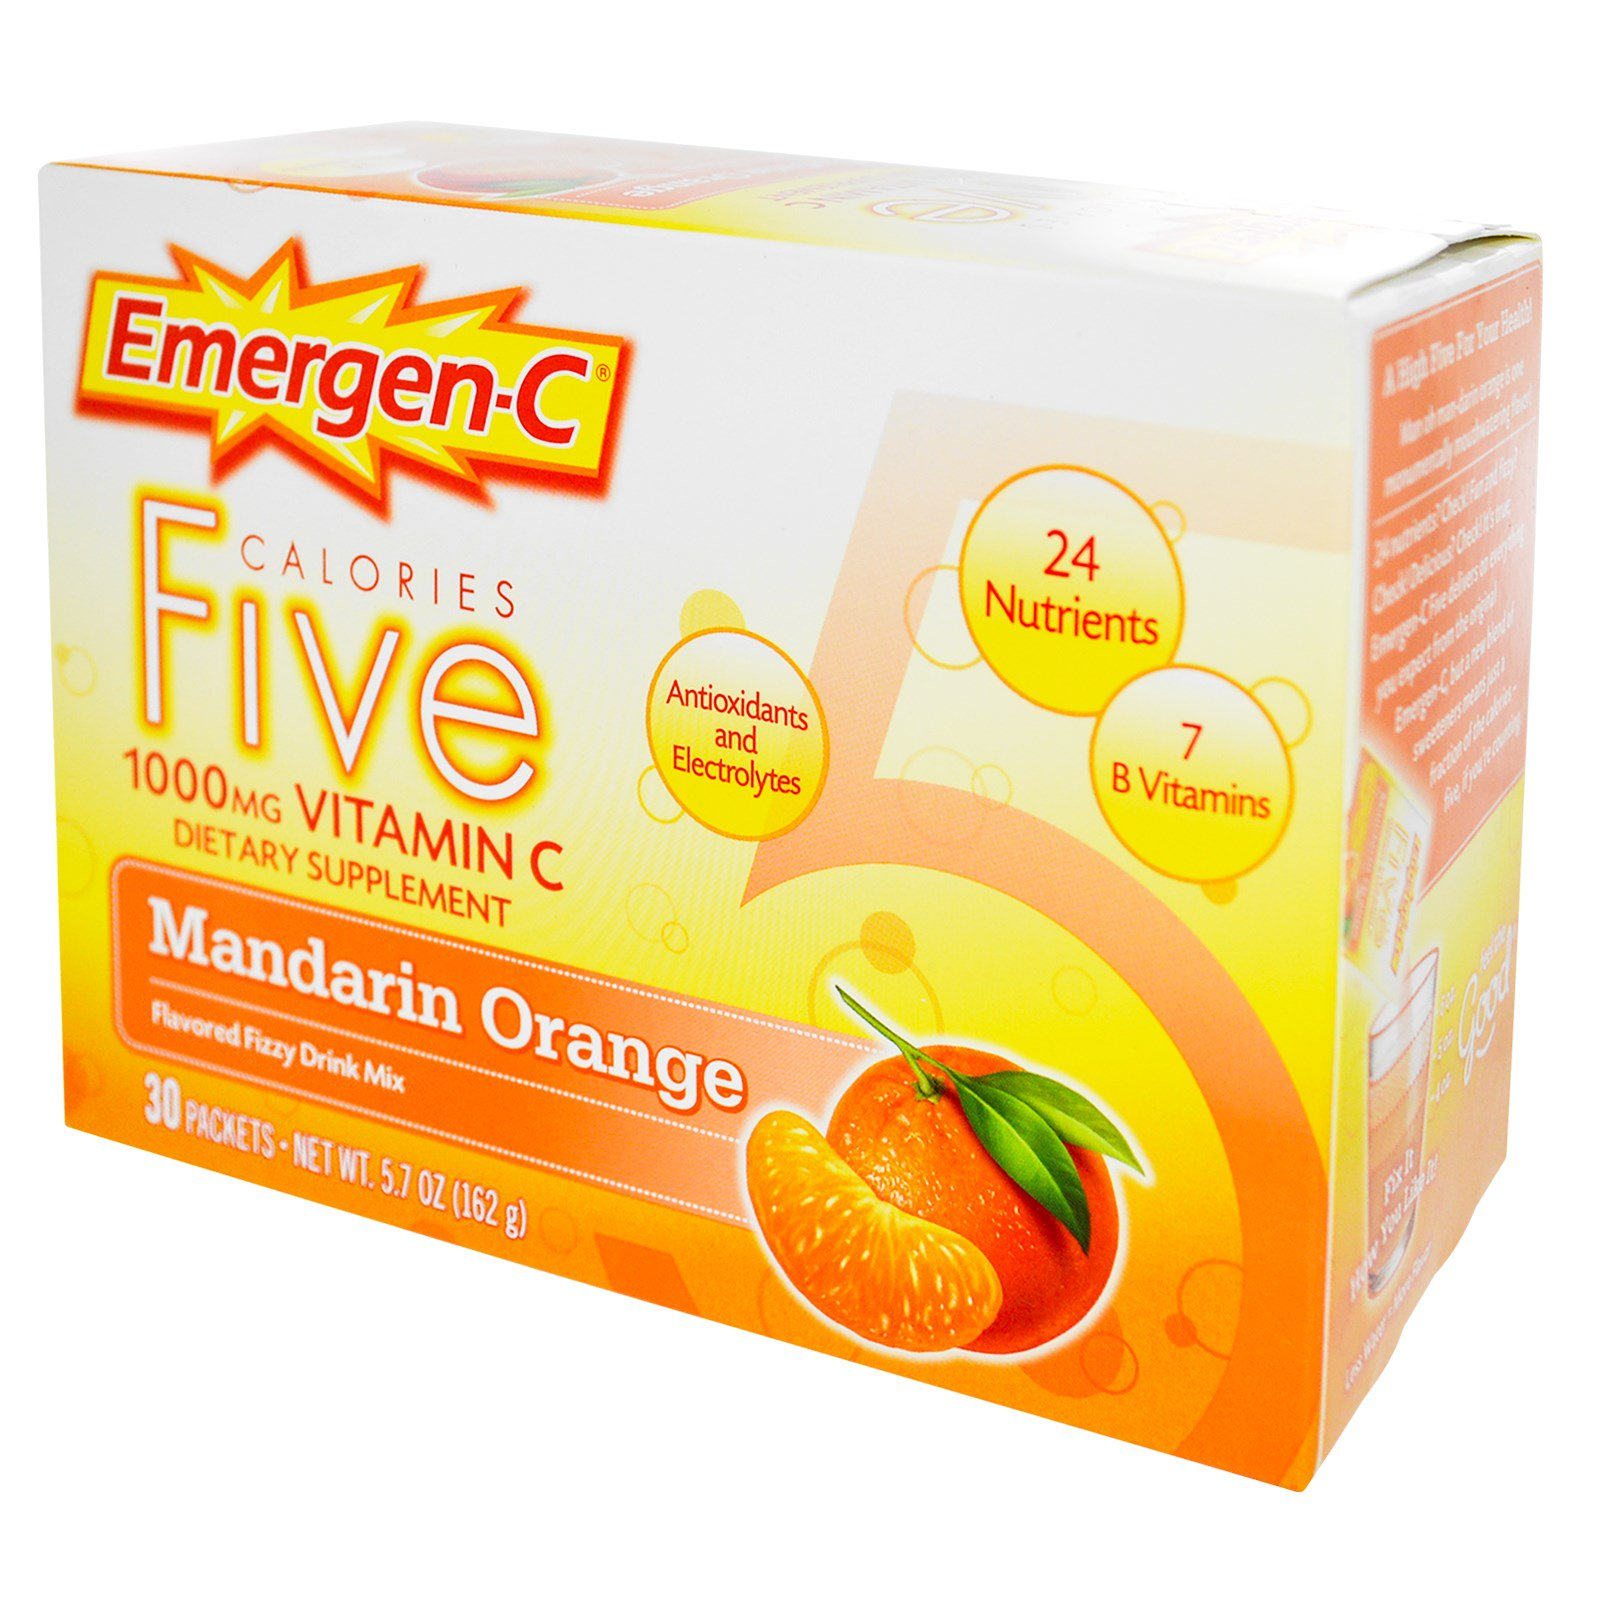 Emergen C Emergen C Five Calories 1000 Mg Vitamin C Mandarin Orange 30 Packets 5 4 G Each Iherb